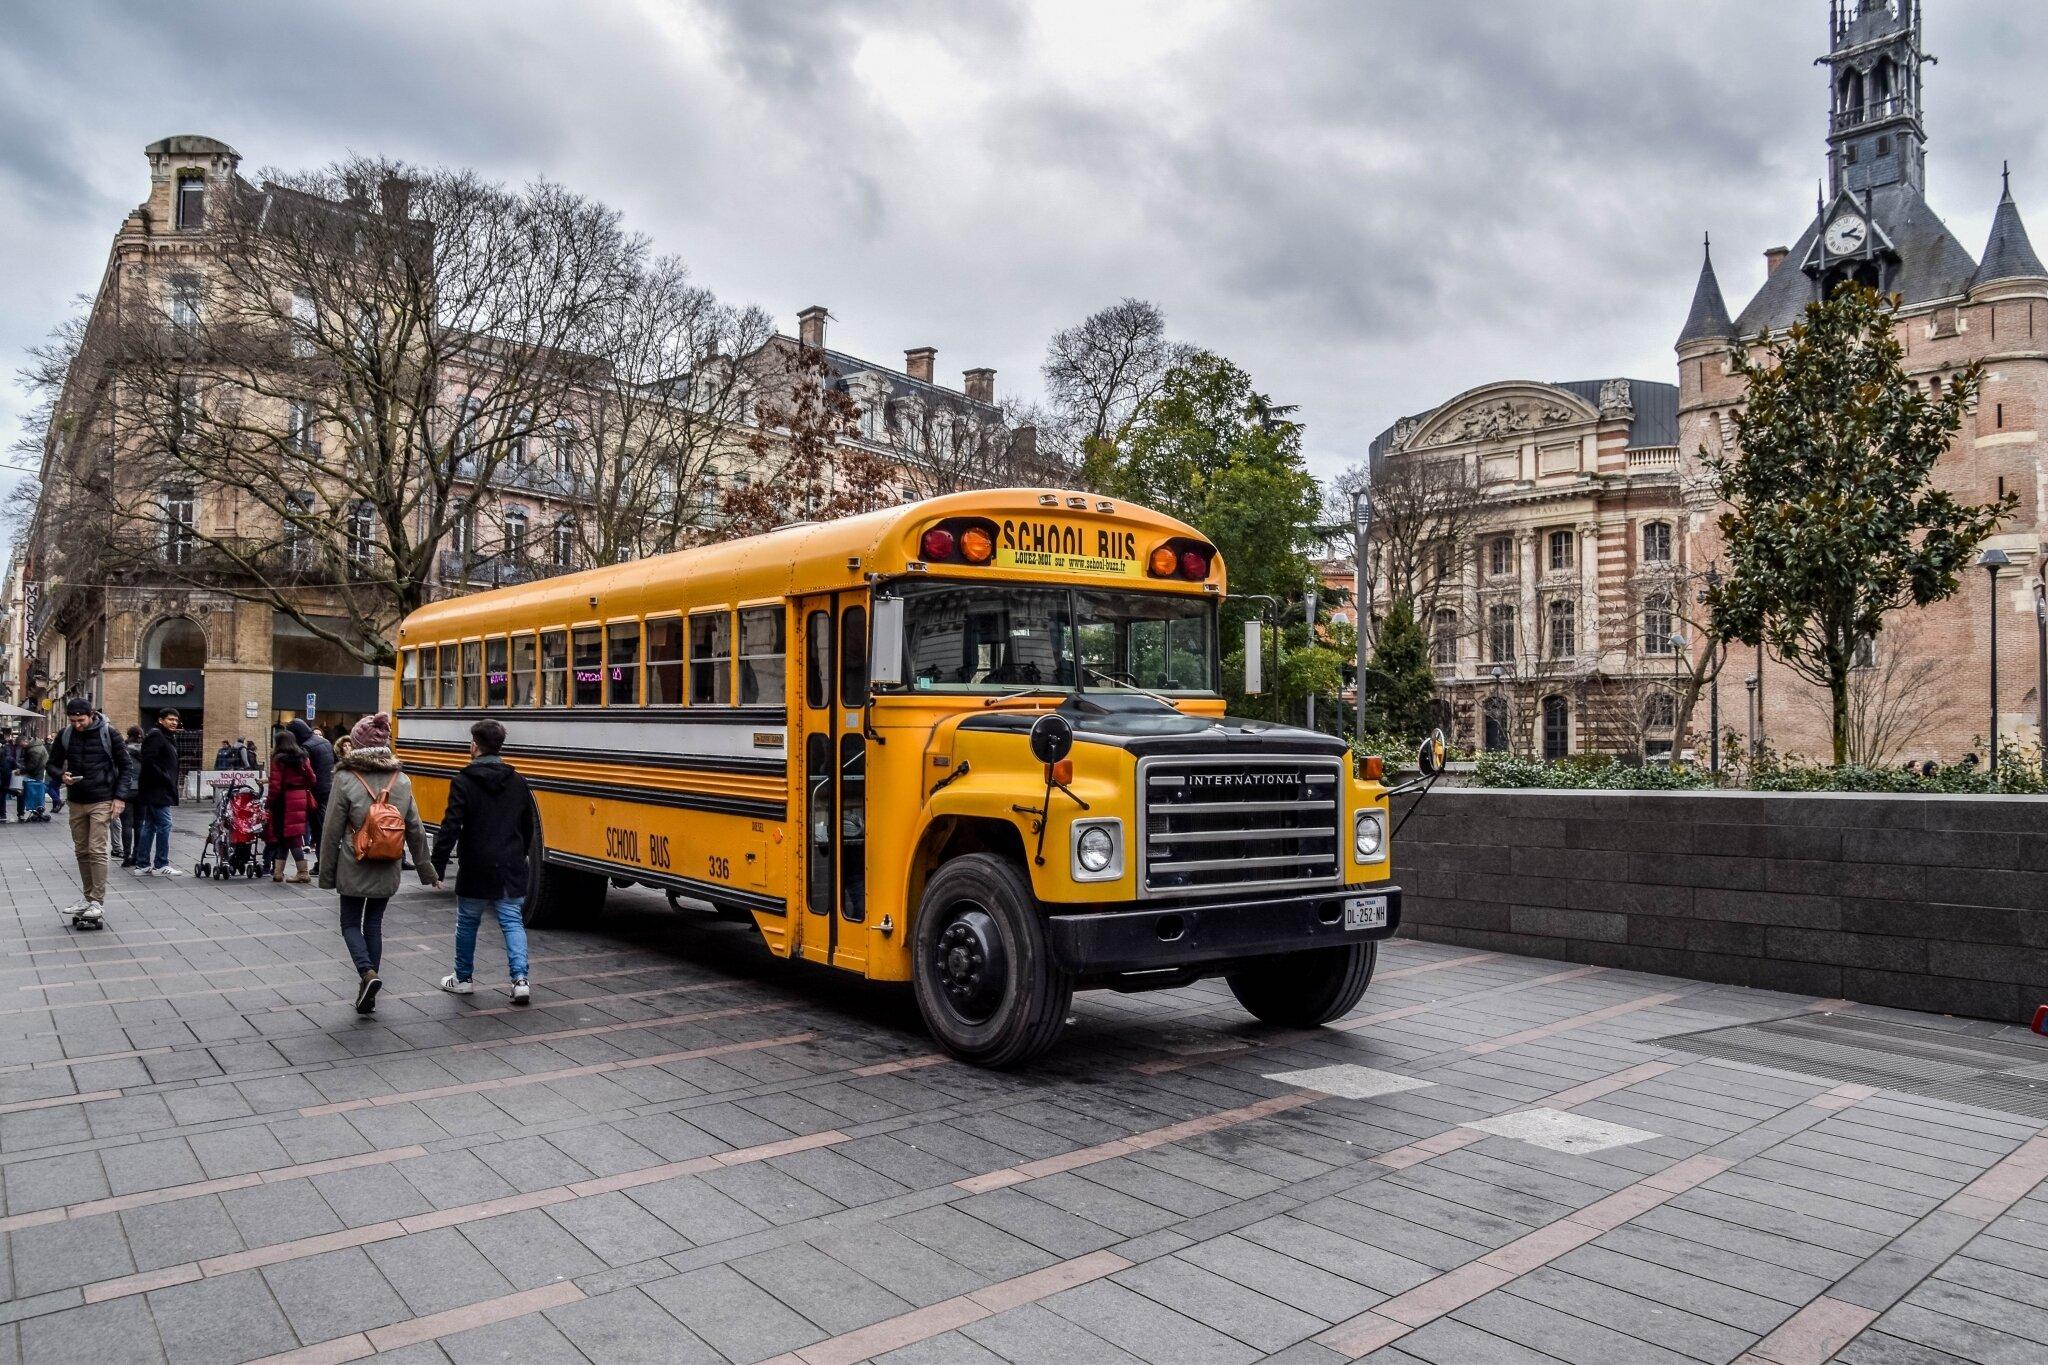 School Bus International Harvester Blog Photo De Breizhell